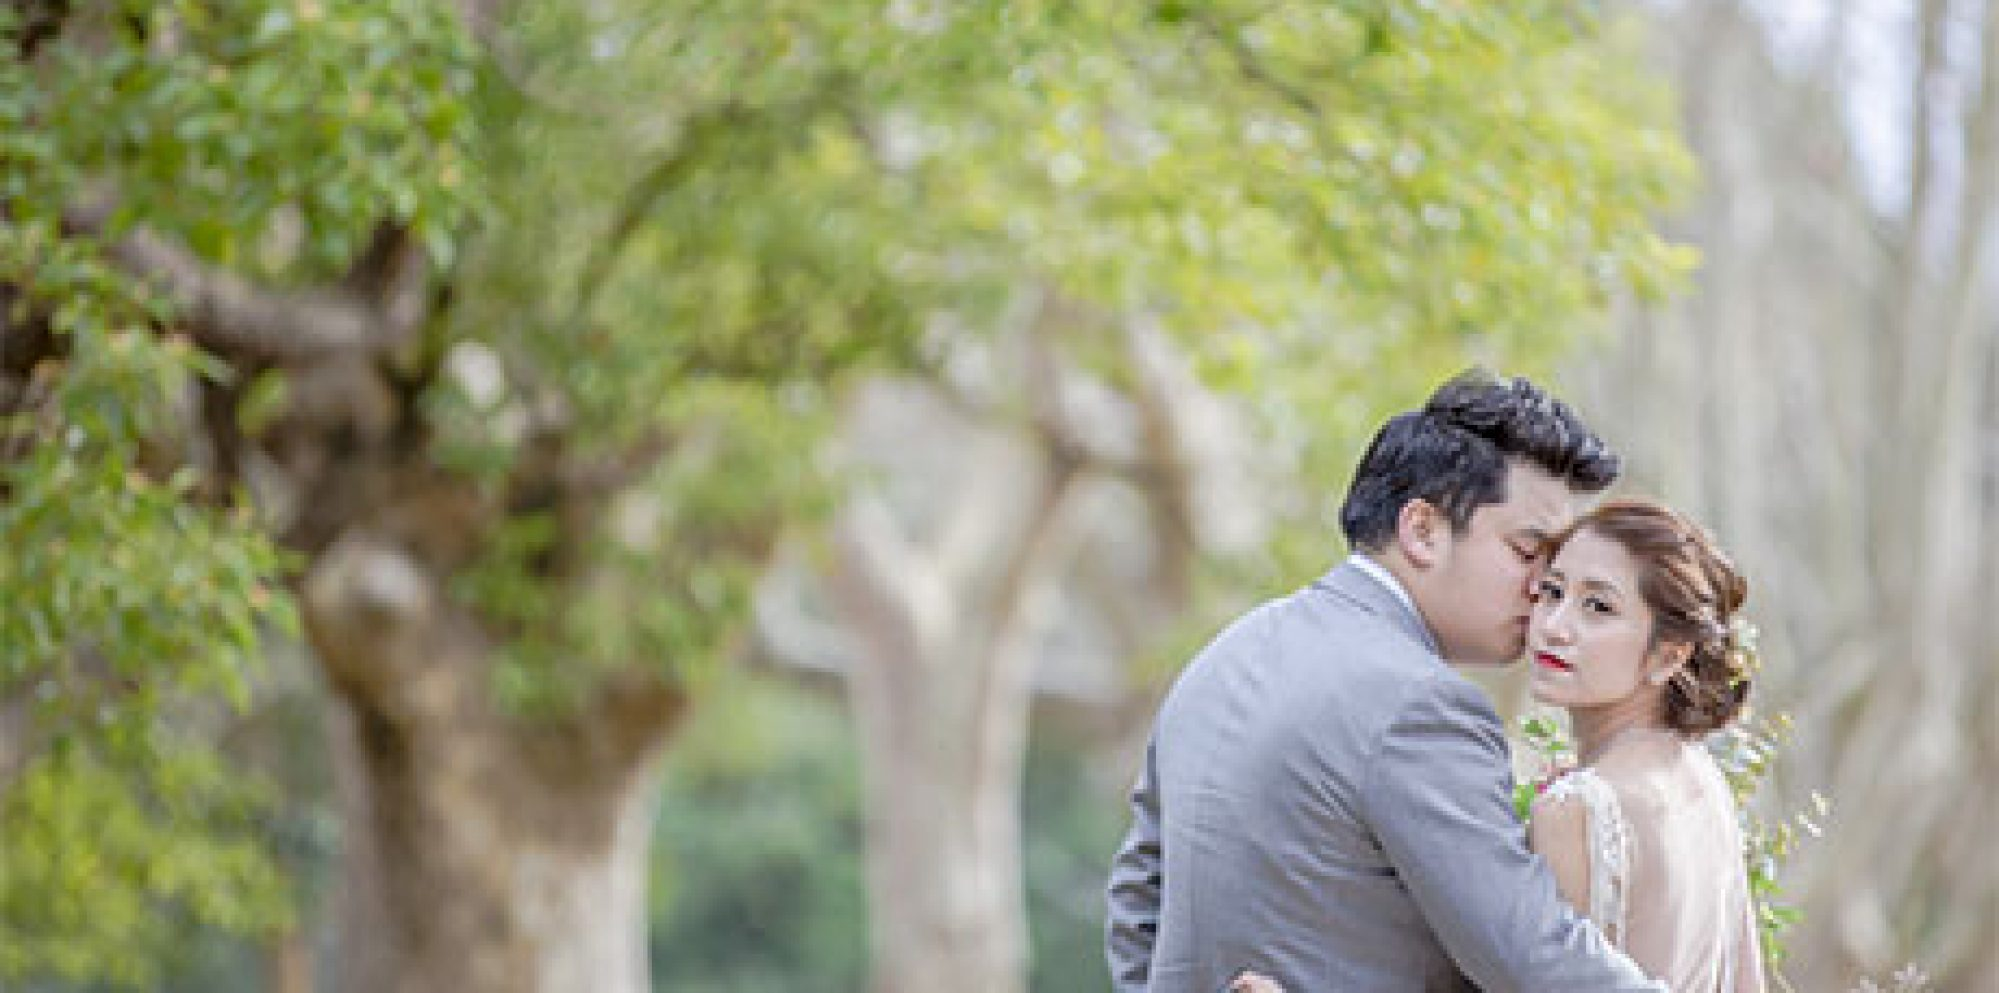 Yana and pat brighton international wedding video melbourne